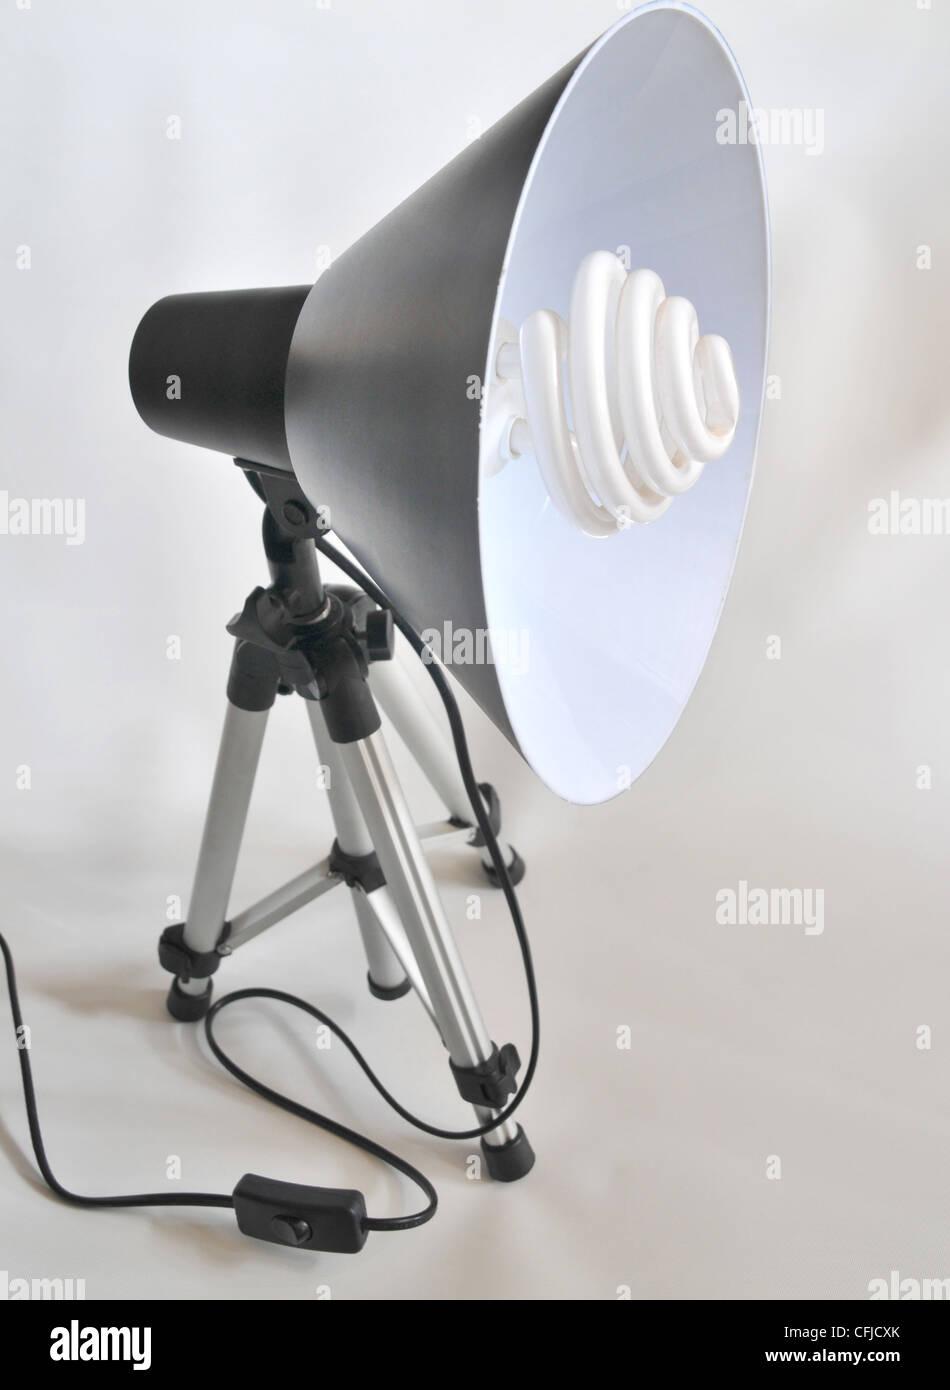 Daylight Fluorescent Studio Light. - Stock Image